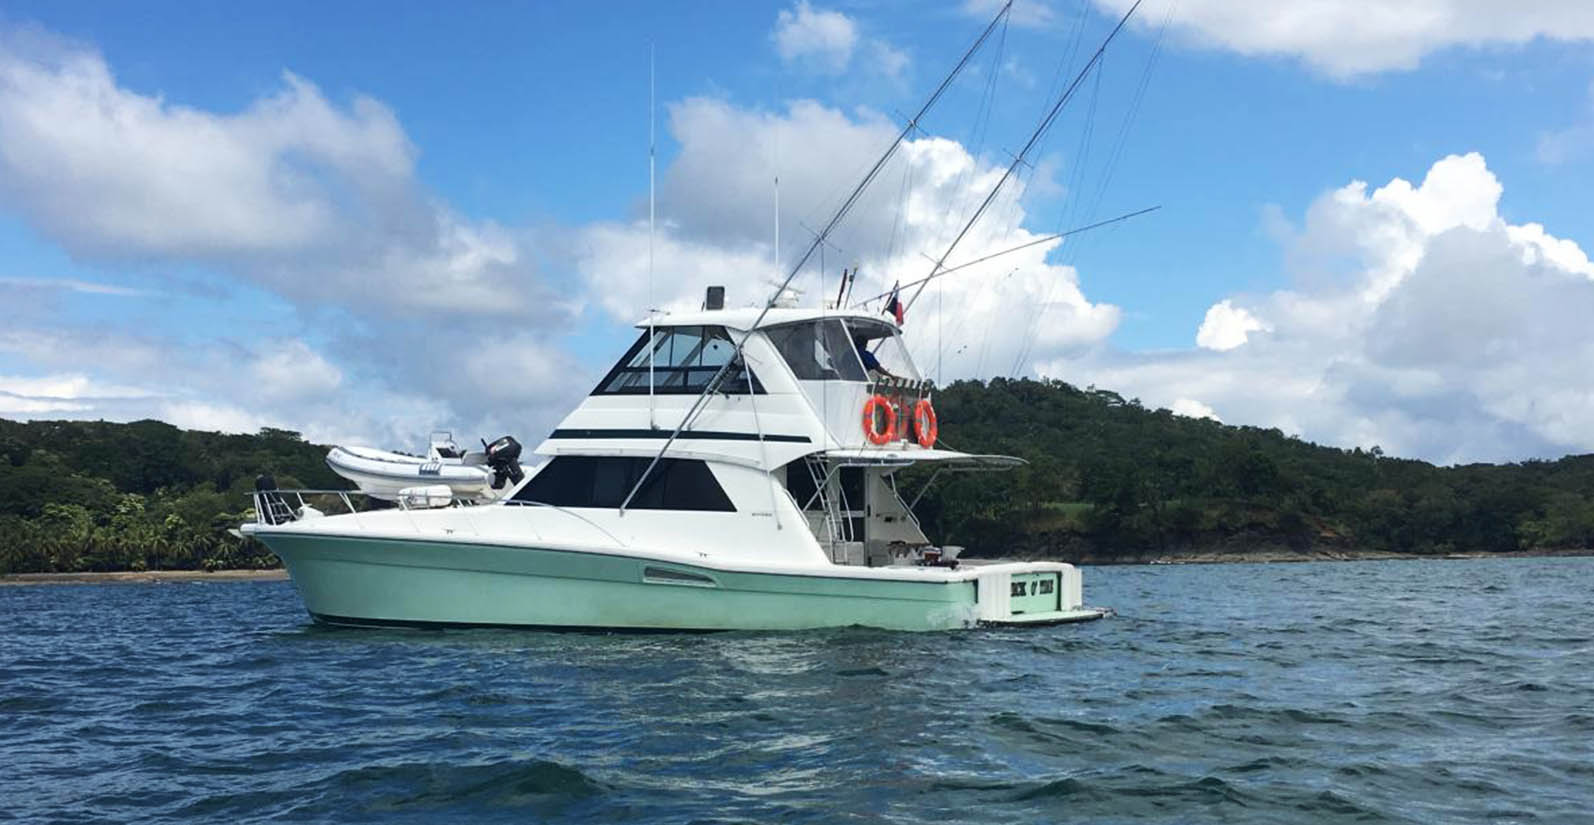 Cala Mia's fishing boat